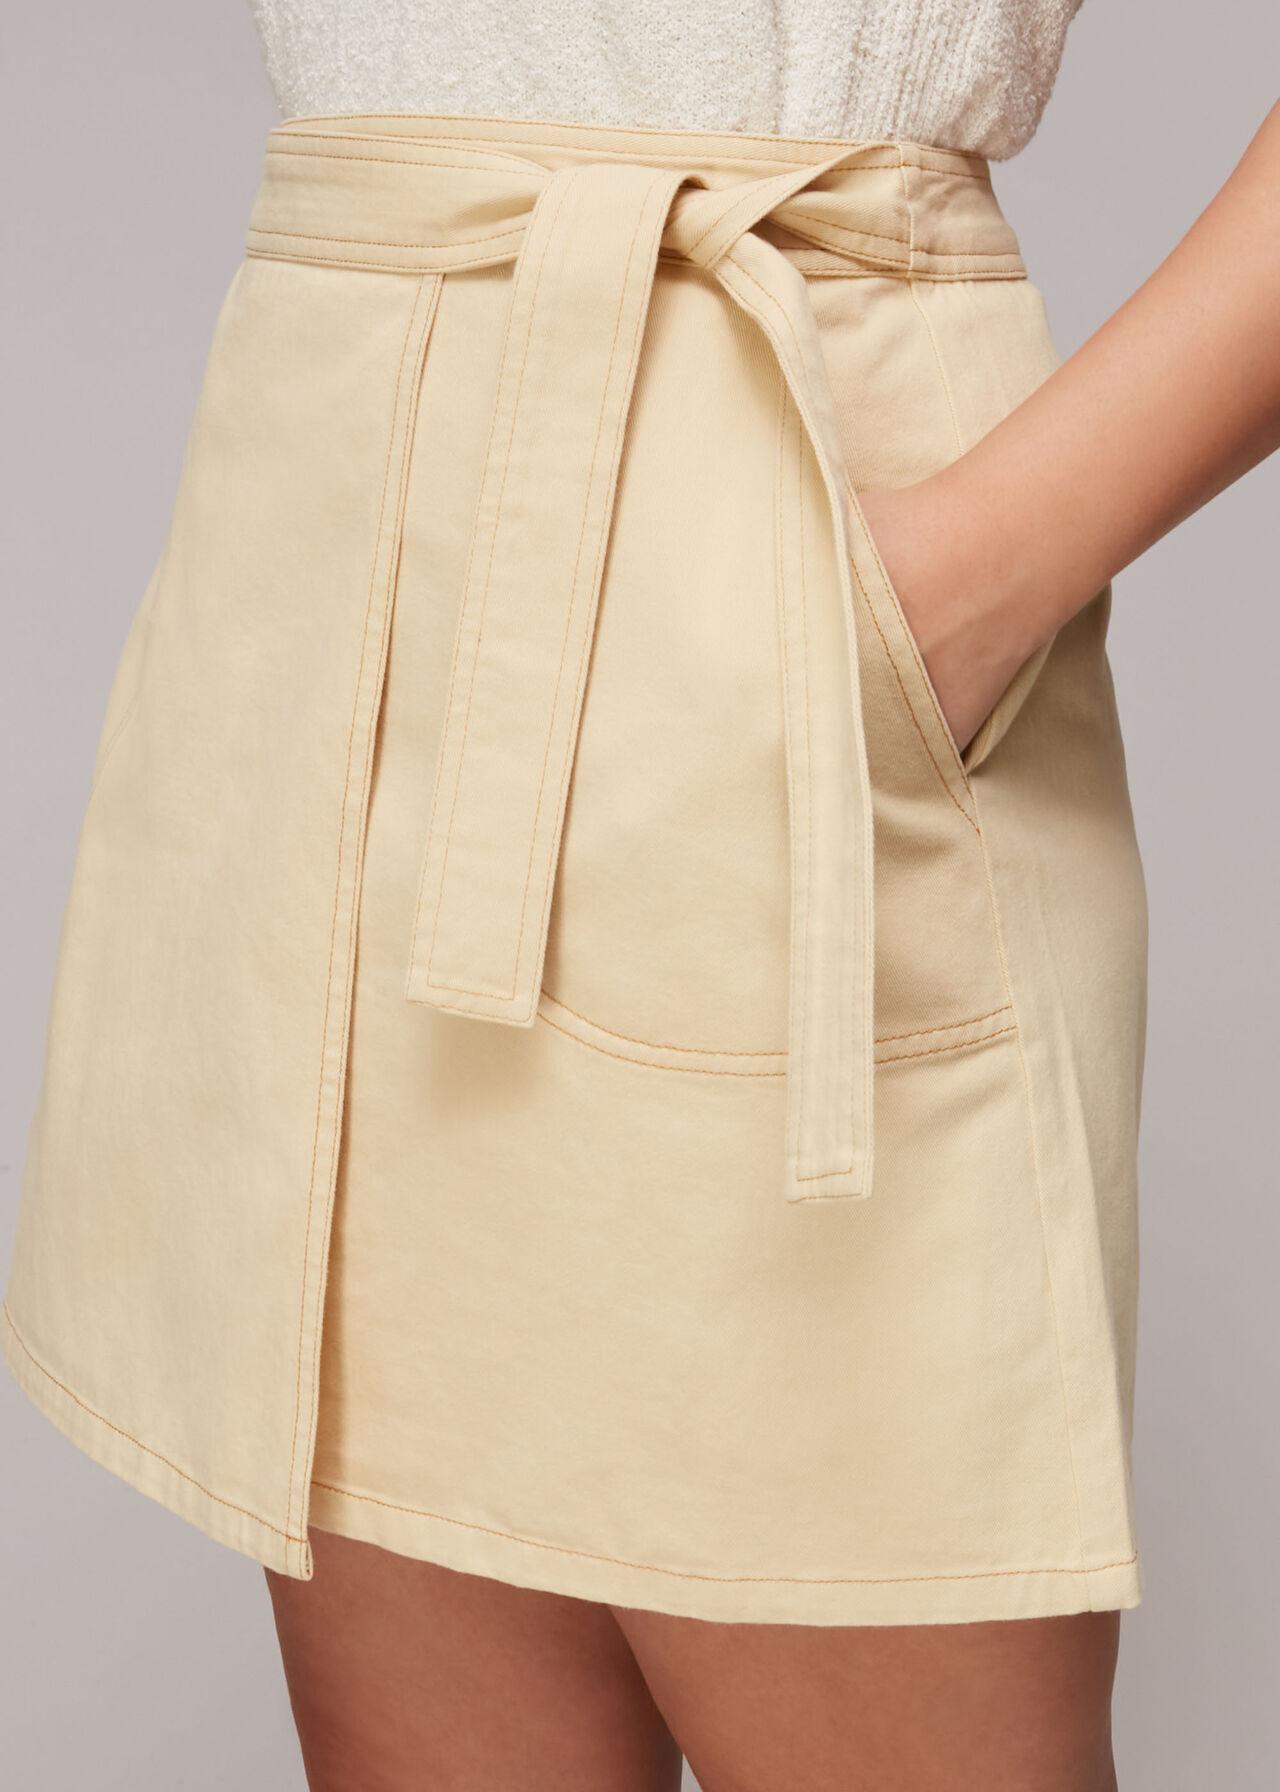 Macie Wrap A Line Skirt